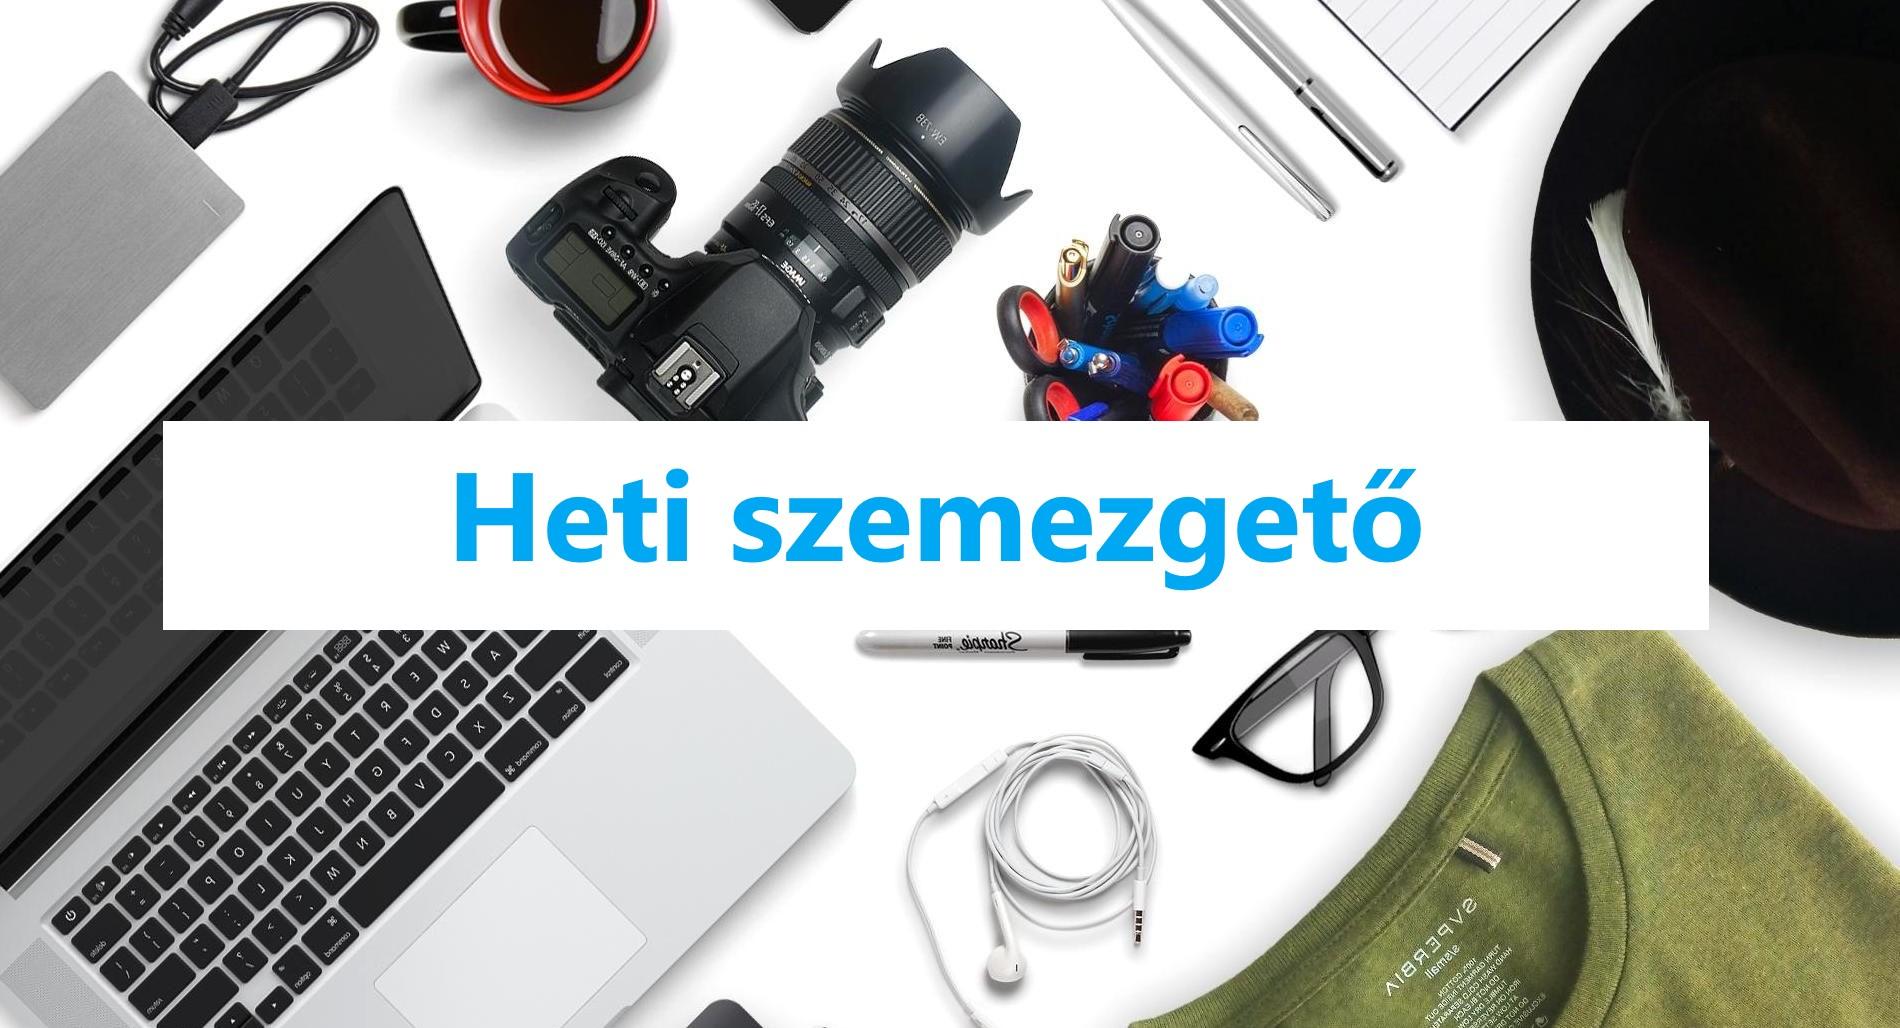 heti_szemezgeto_uj_25.jpg